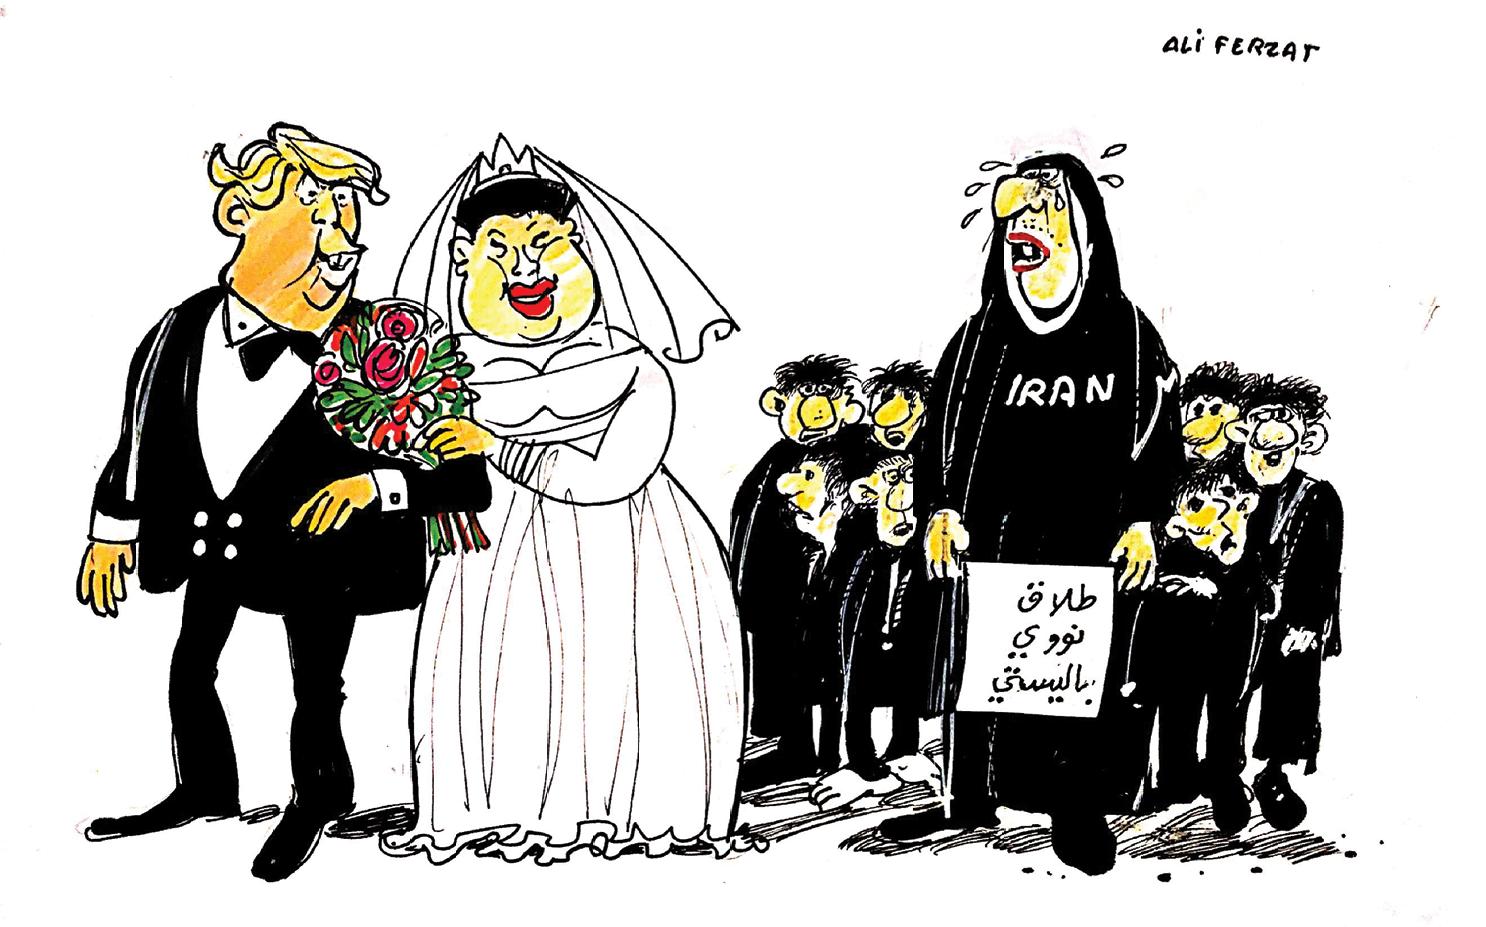 Caricature by Ali Ferzat